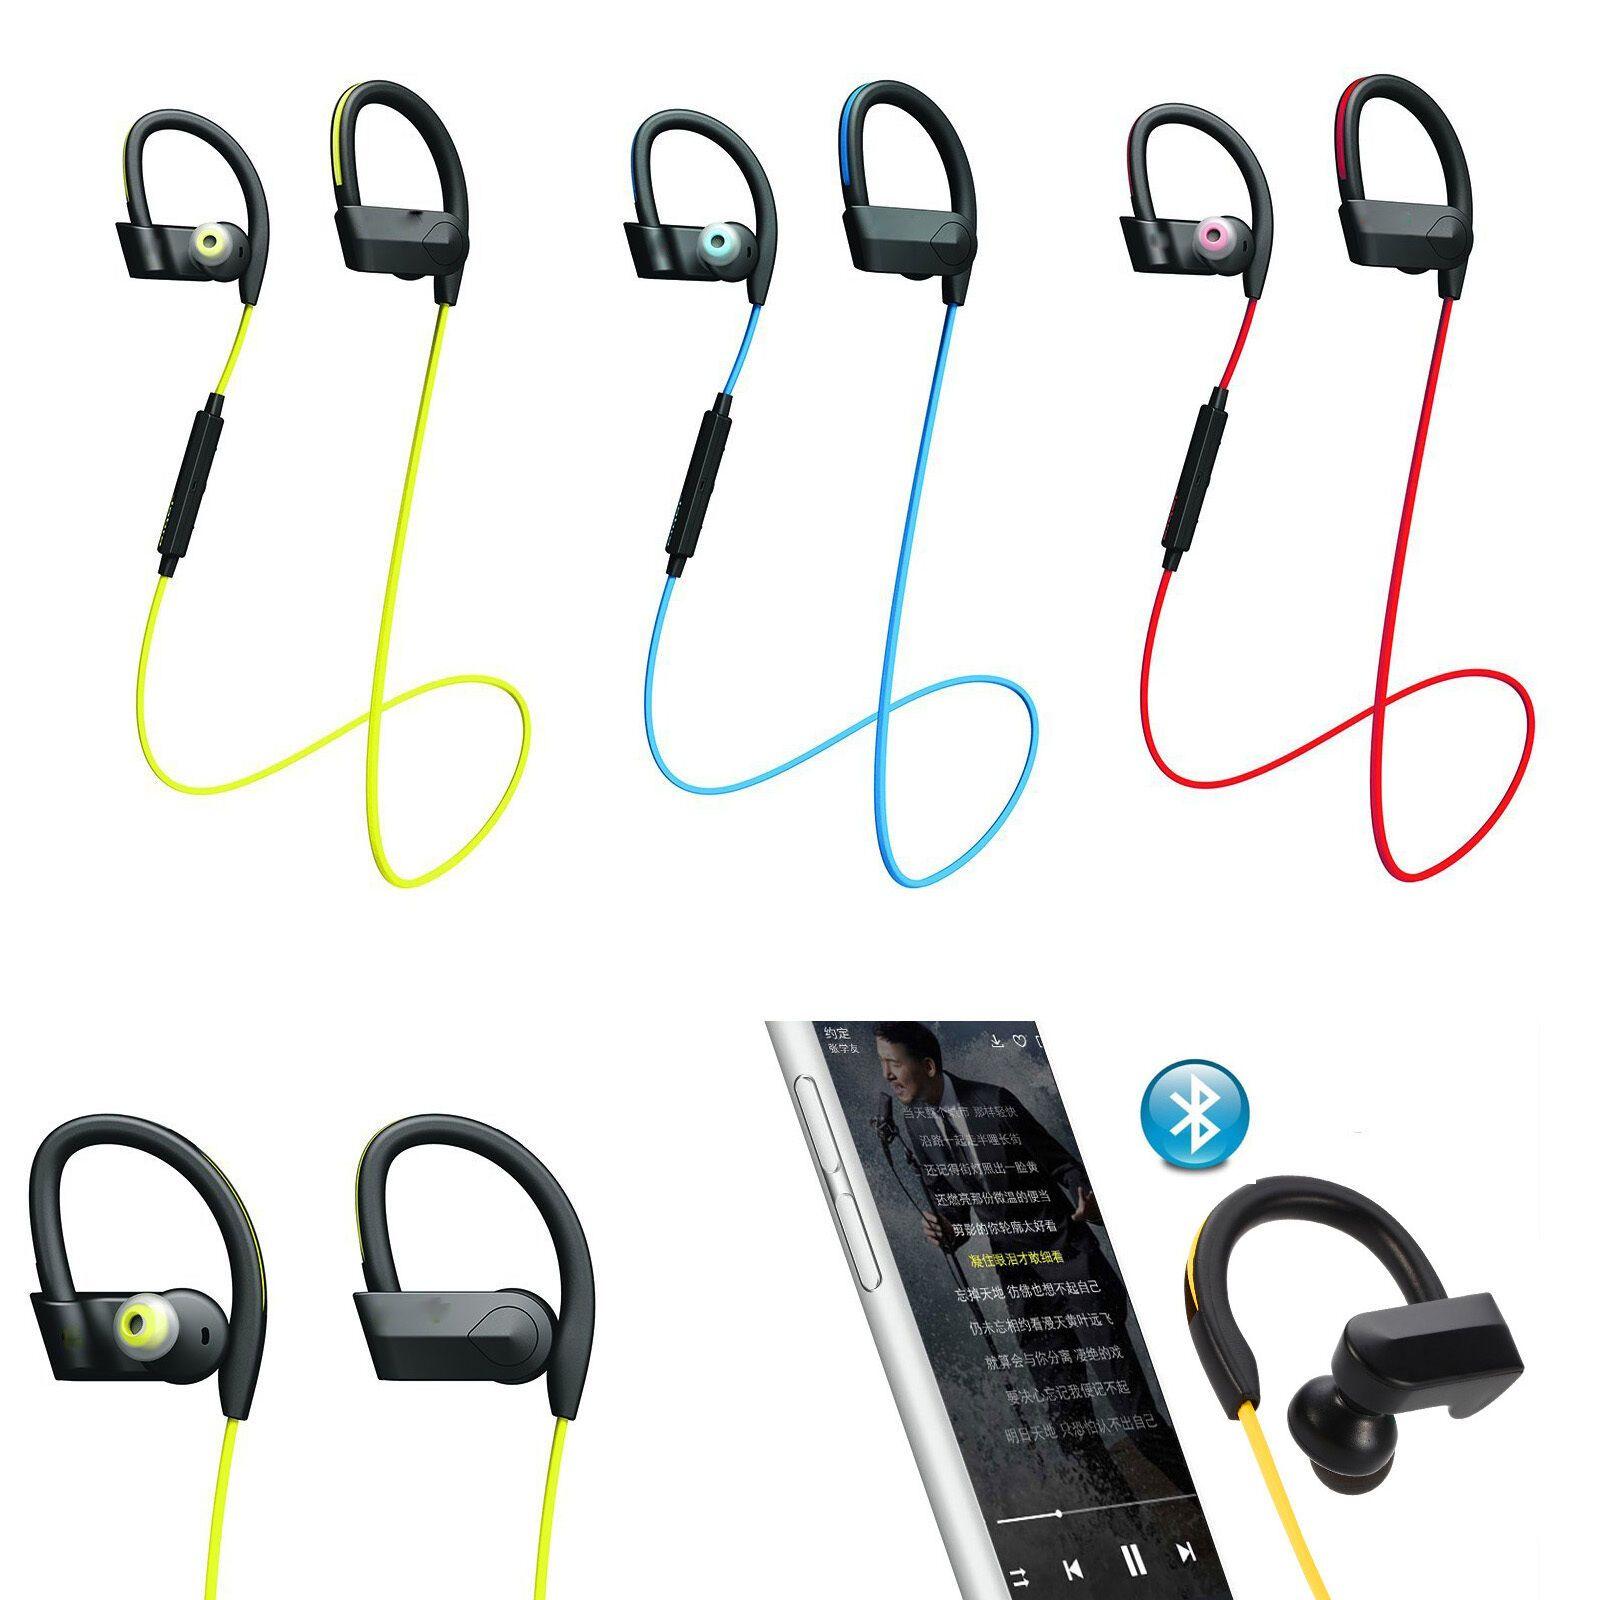 Sweatproof Sports Bluetooth Earbuds Headset Headphone for